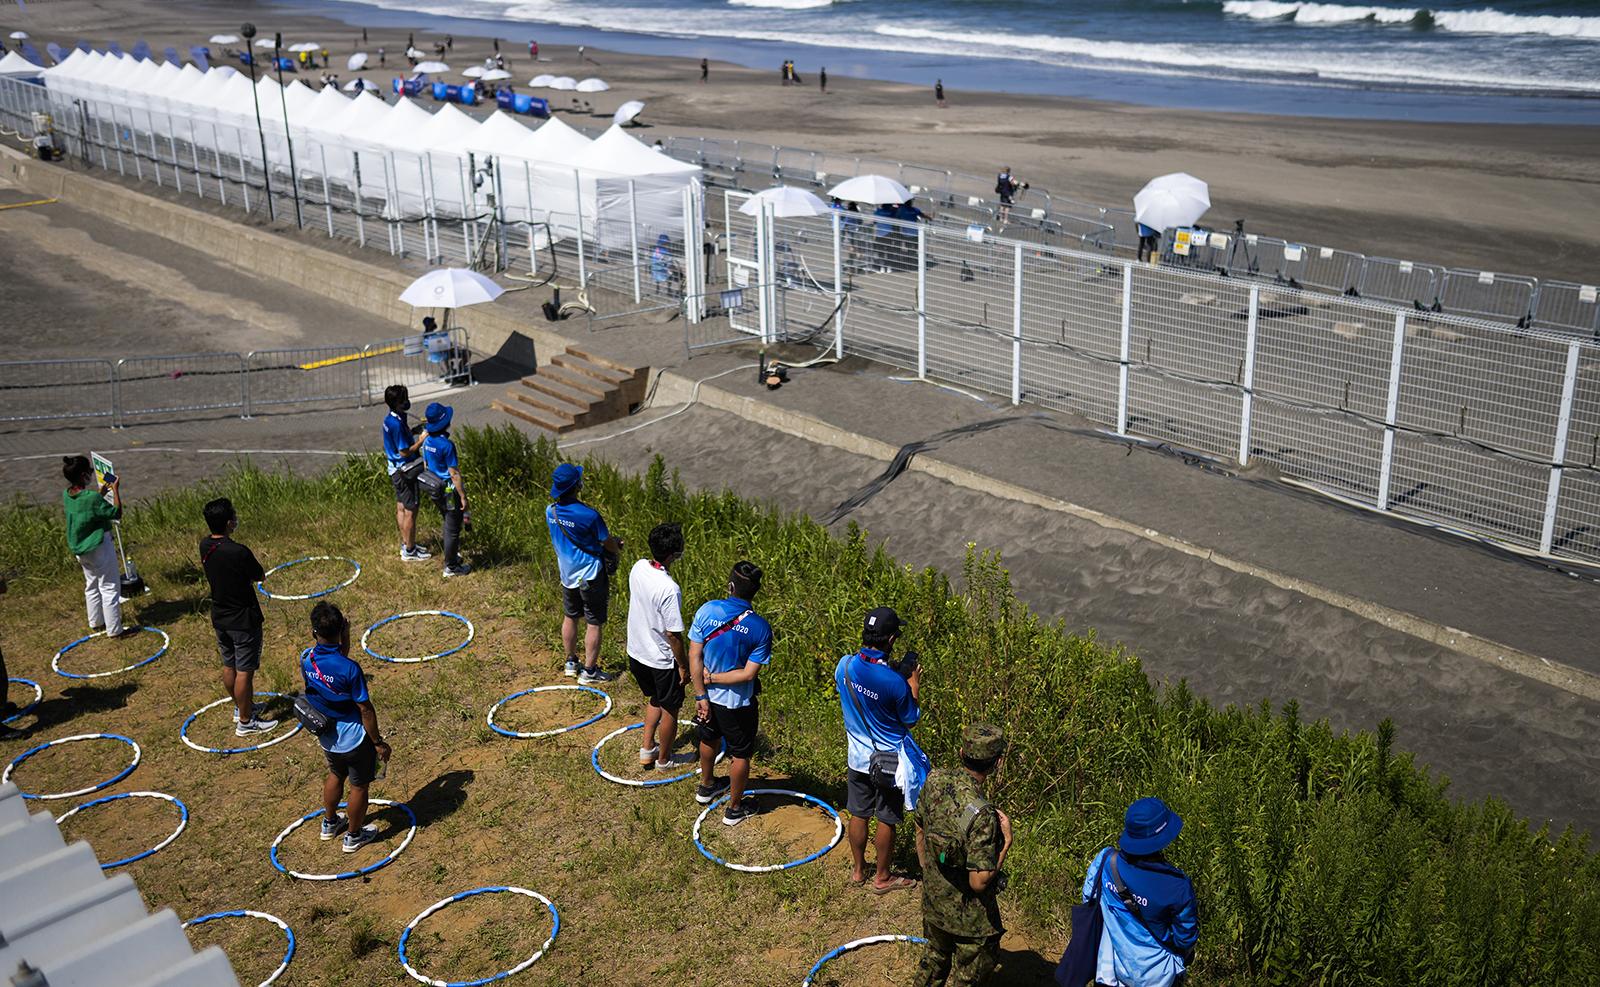 Volunteers keep social distance as they watch surfing at the 2020 Summer Olympics, Sunday, July 25, 2021, at Tsurigasaki beach in Ichinomiya, Japan. AP